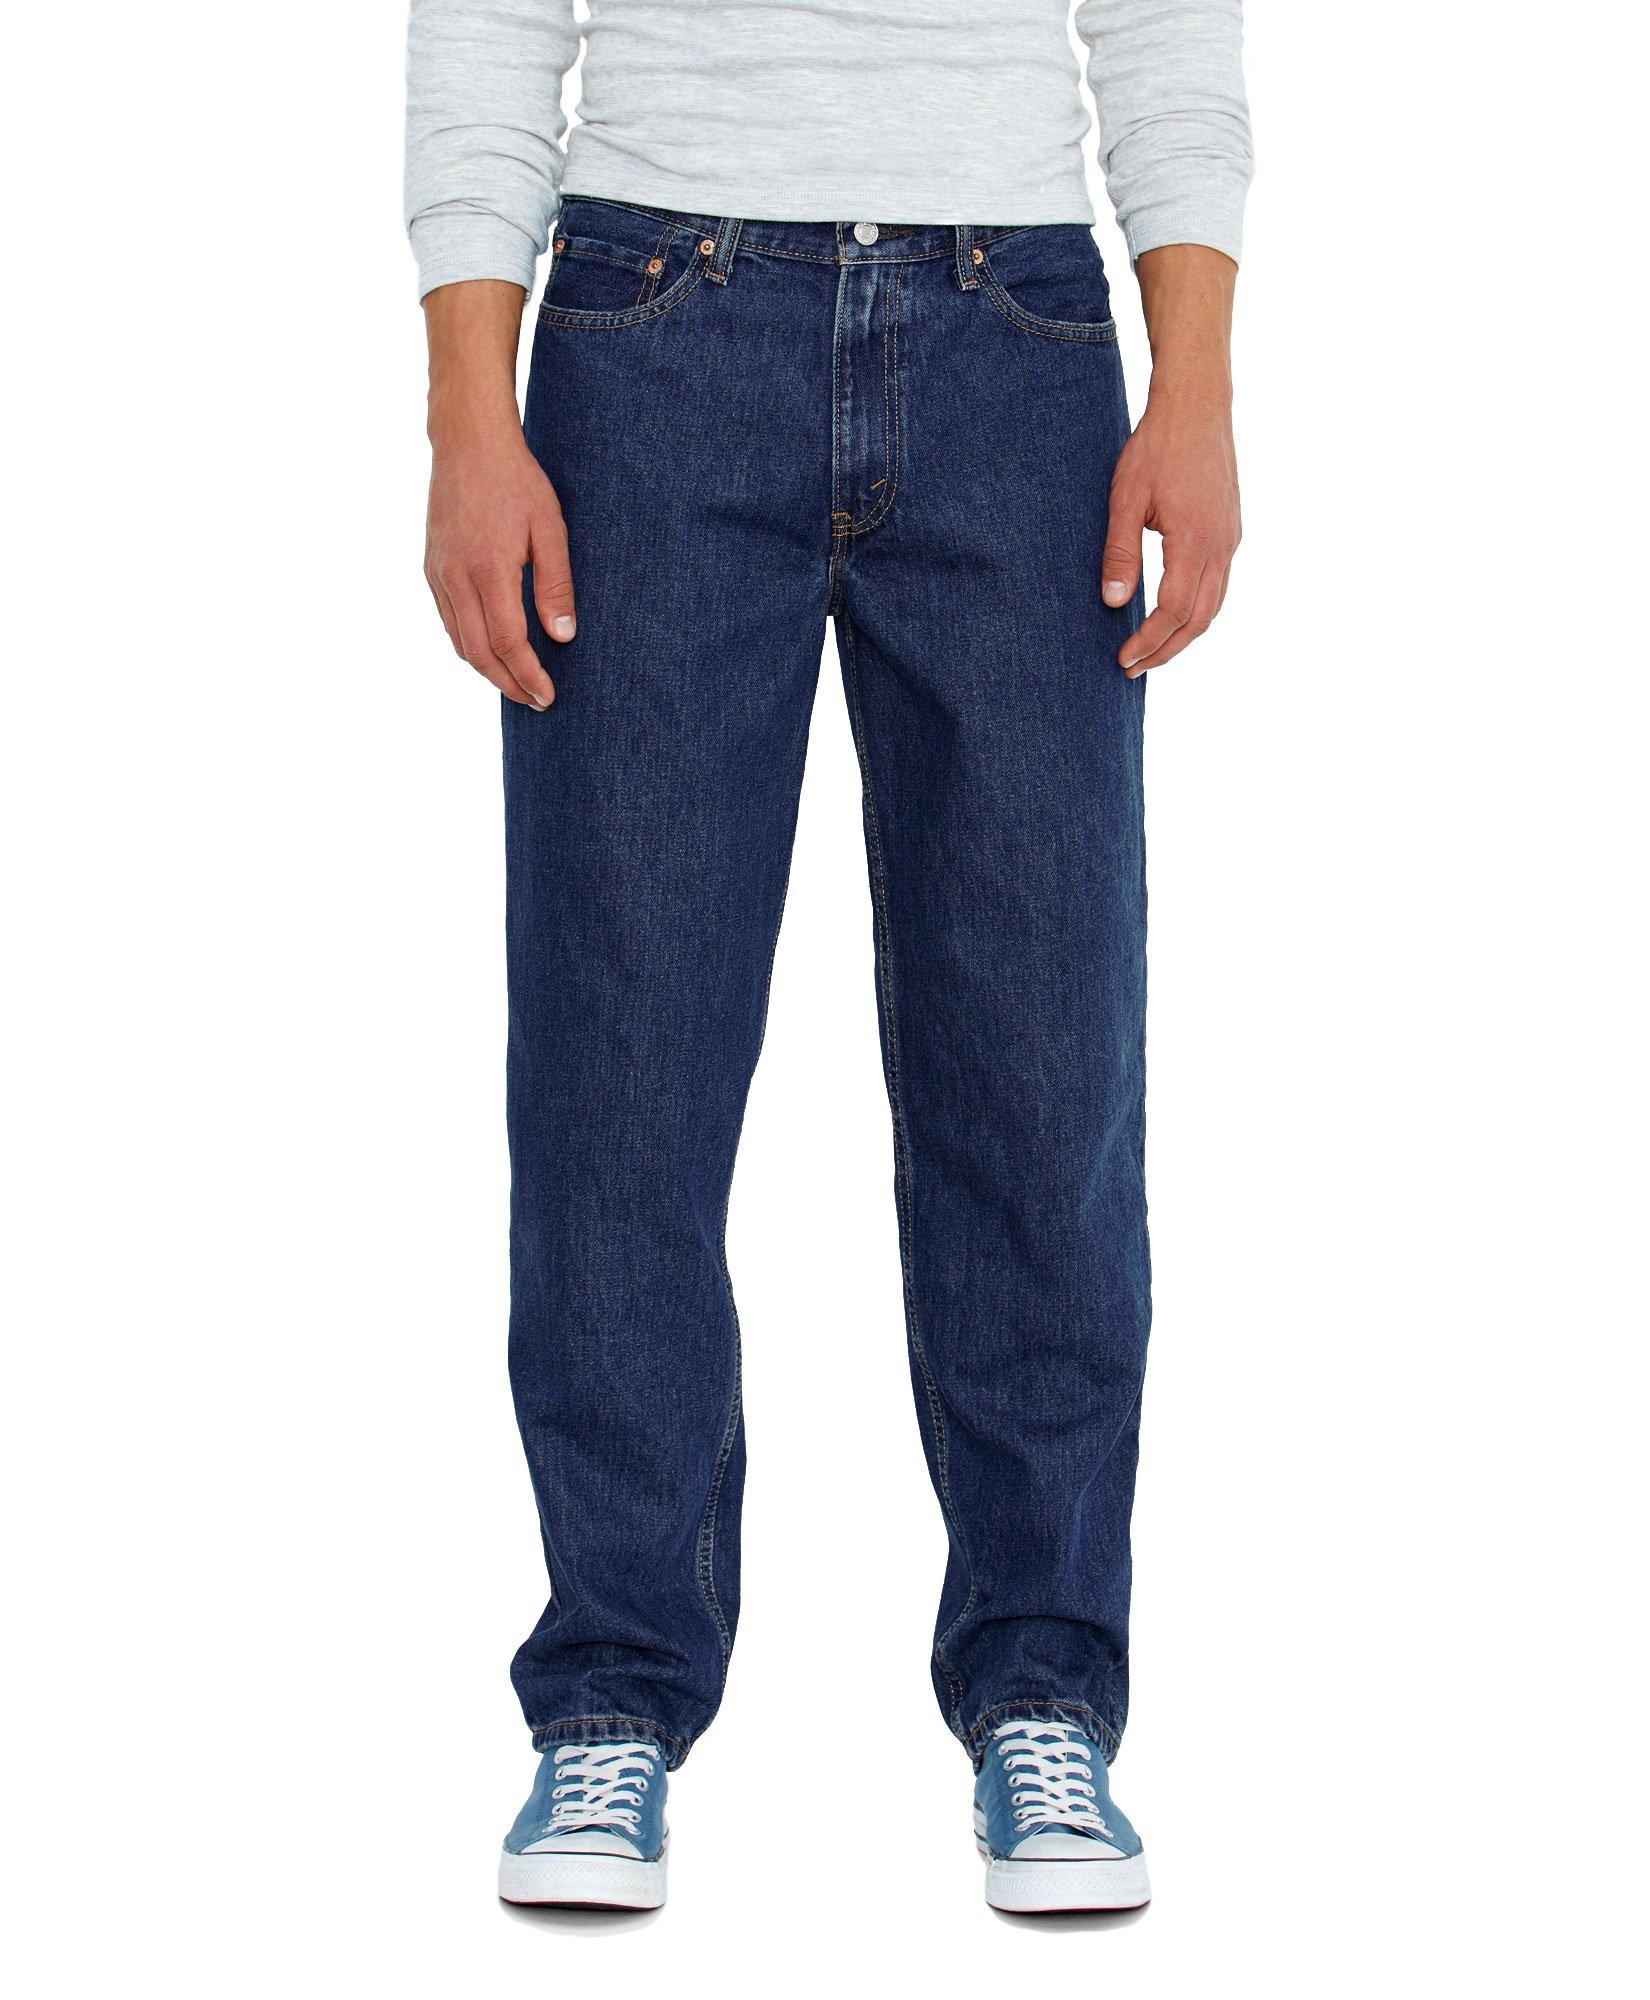 Levi's Men's 560 Comfort Fit Denim Jeans, Dark Stonewash, 42x34